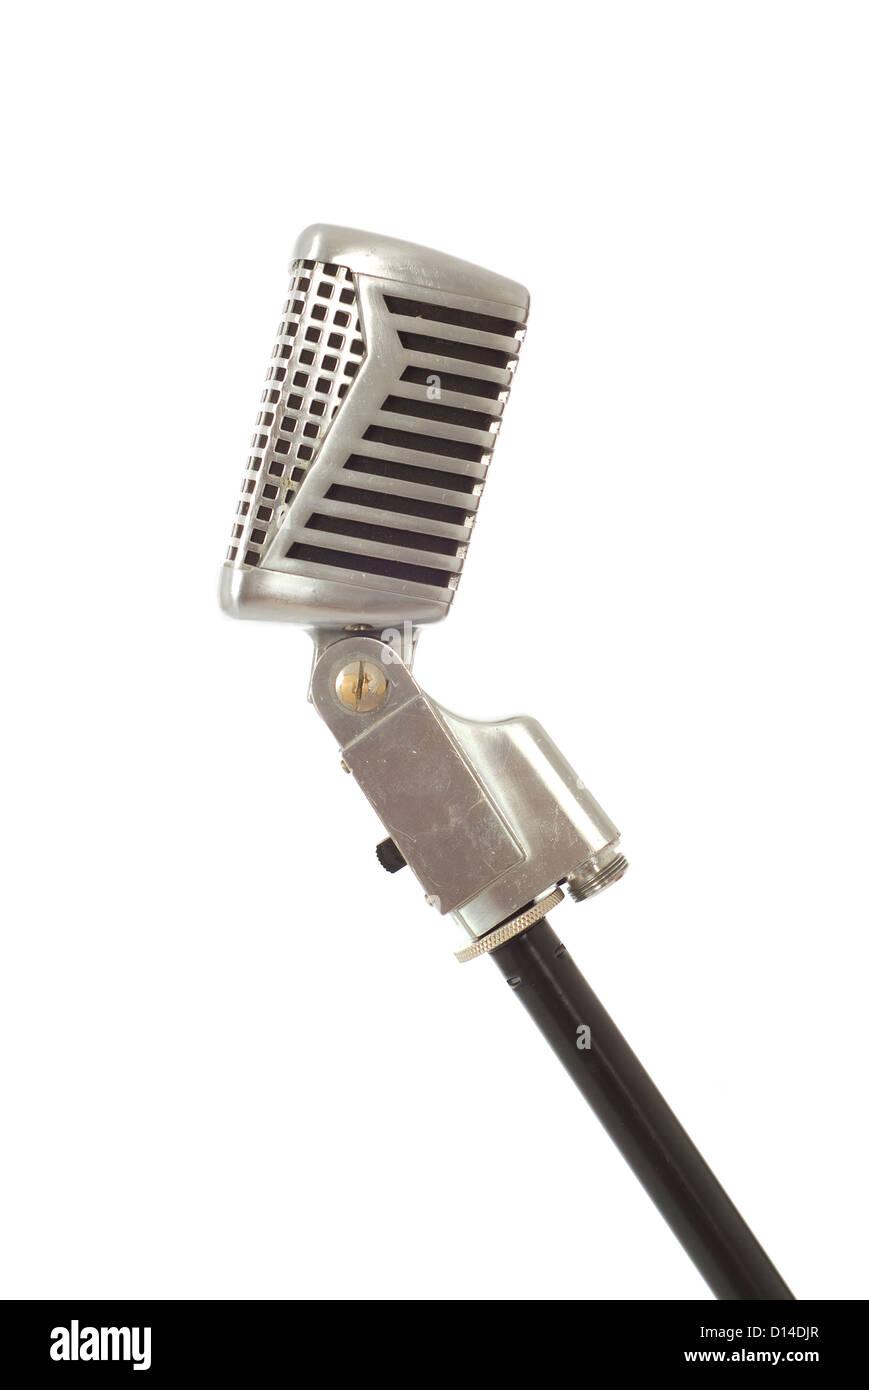 Enregistrement vintage, annonçant ou le chant microphone isolated on white Photo Stock